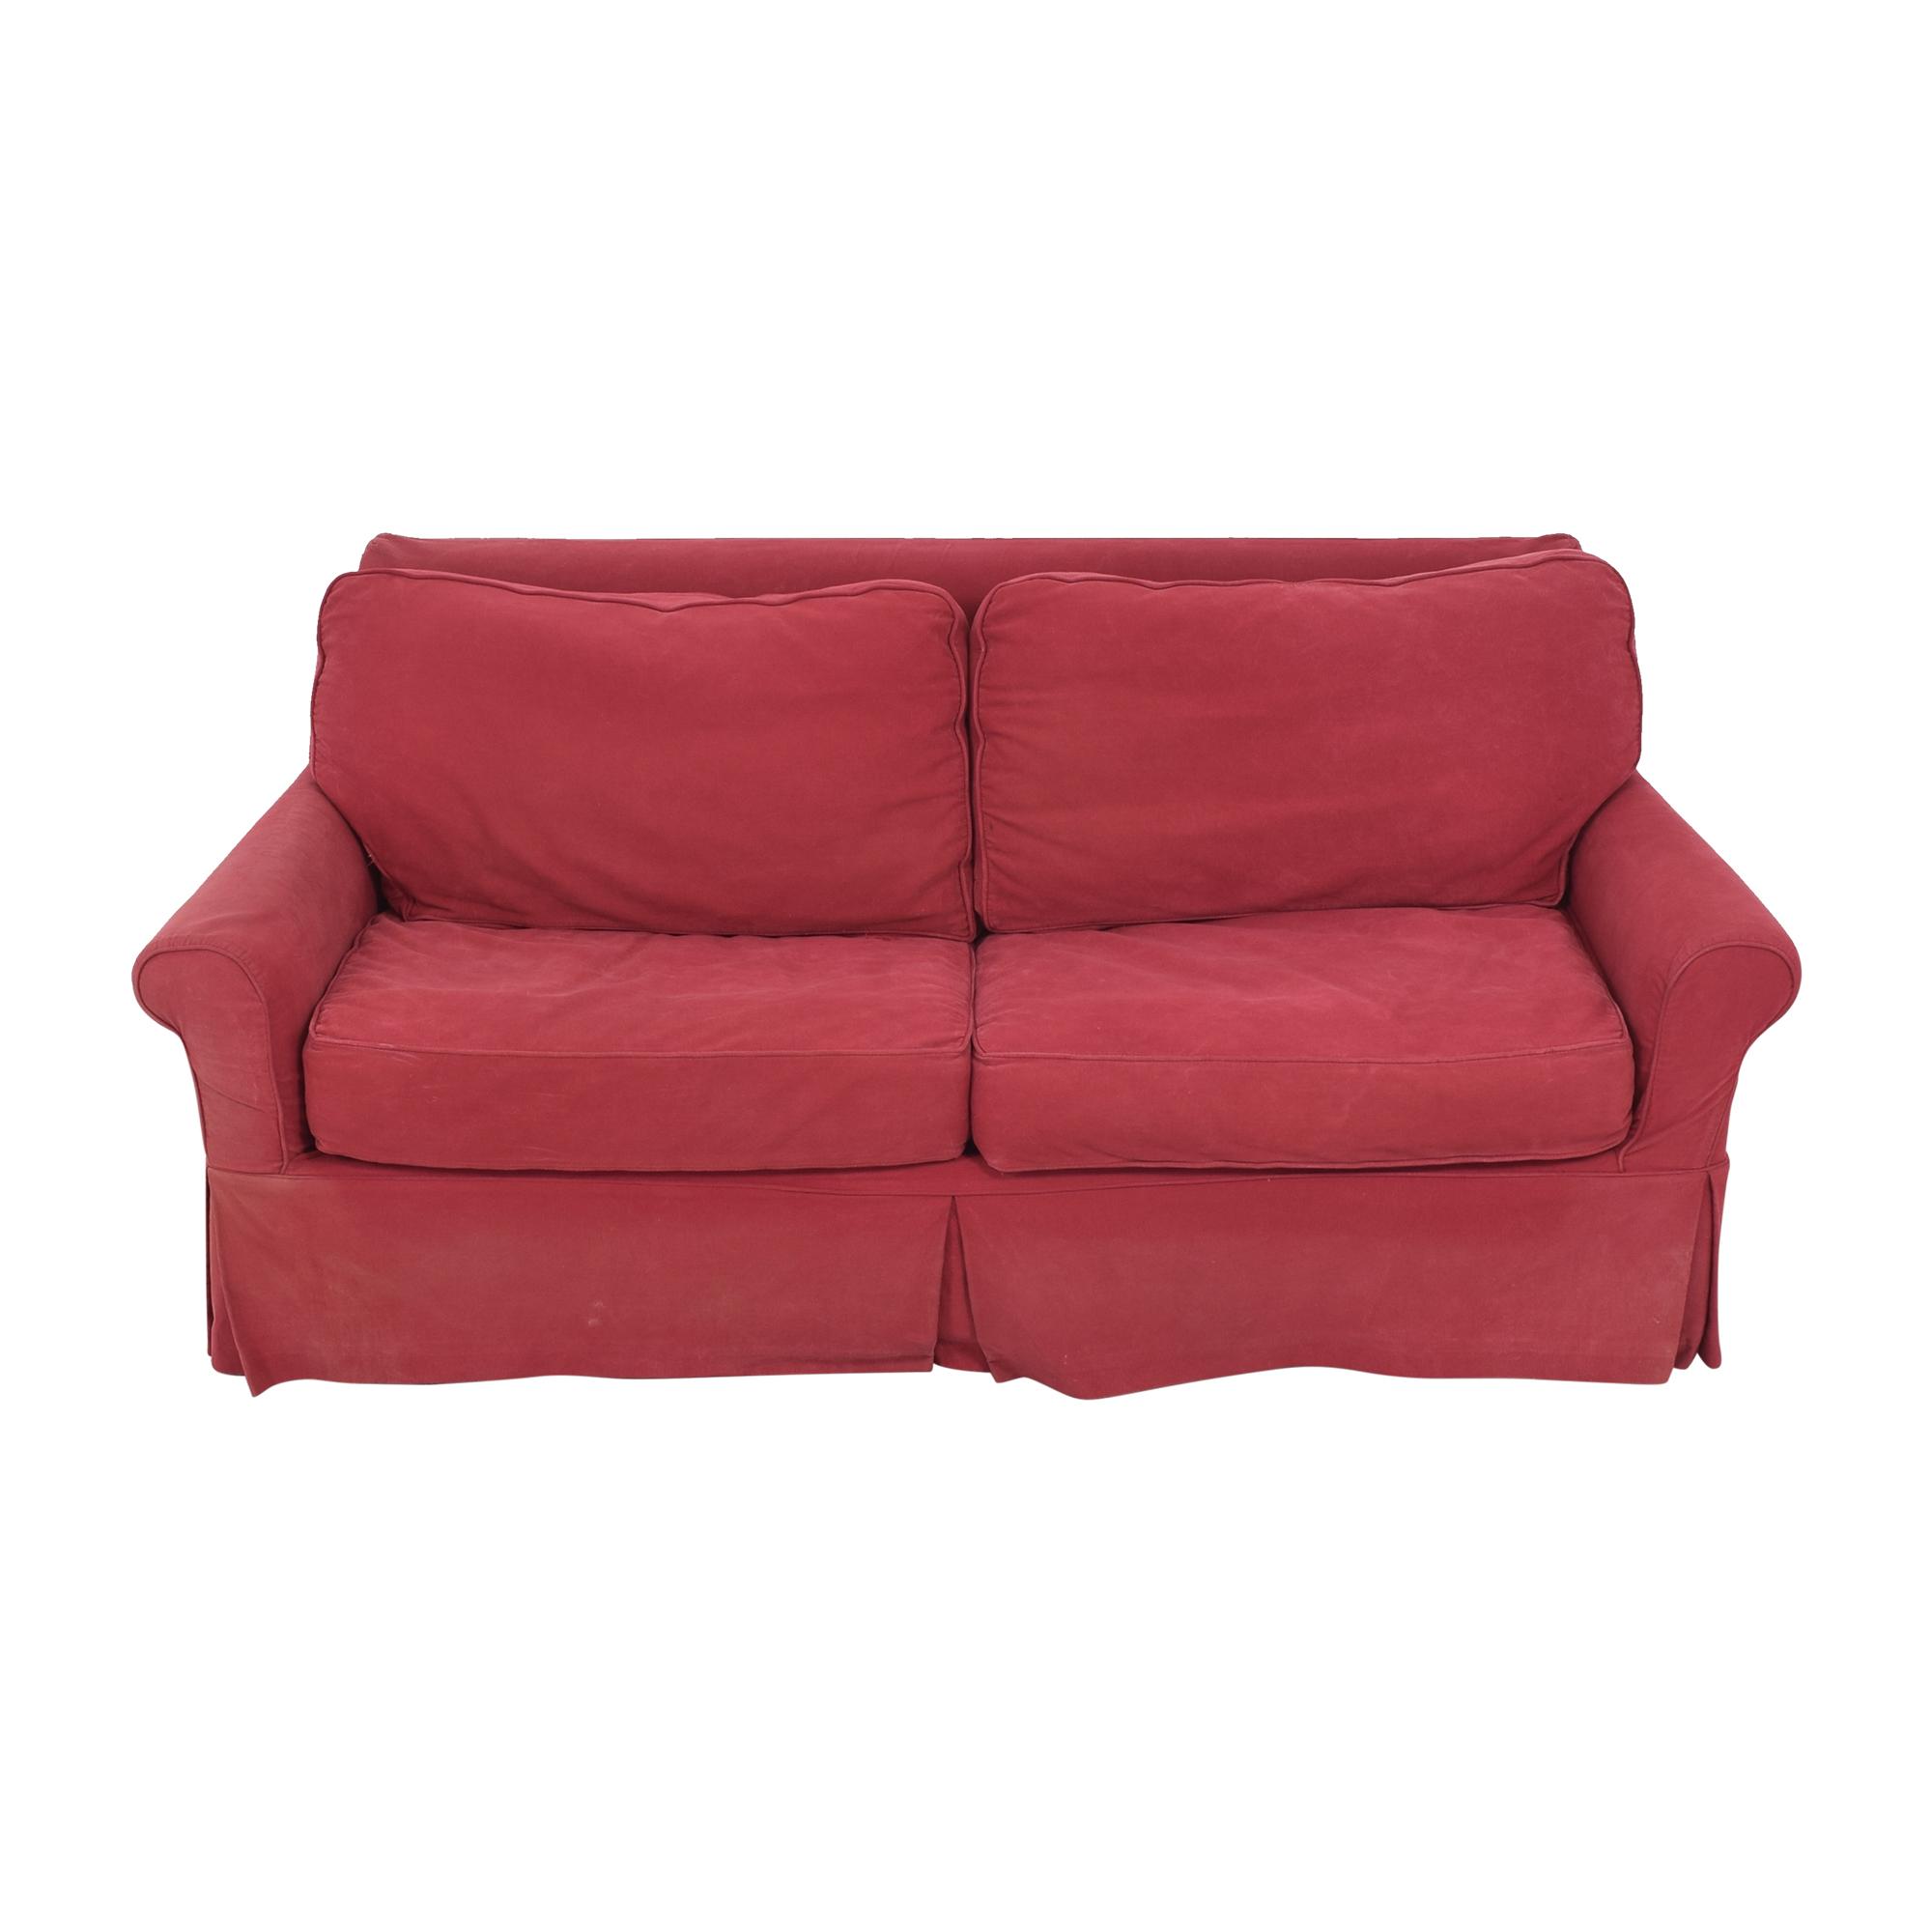 Crate & Barrel Roll Arm Slipcovered Sleeper Sofa / Sofas